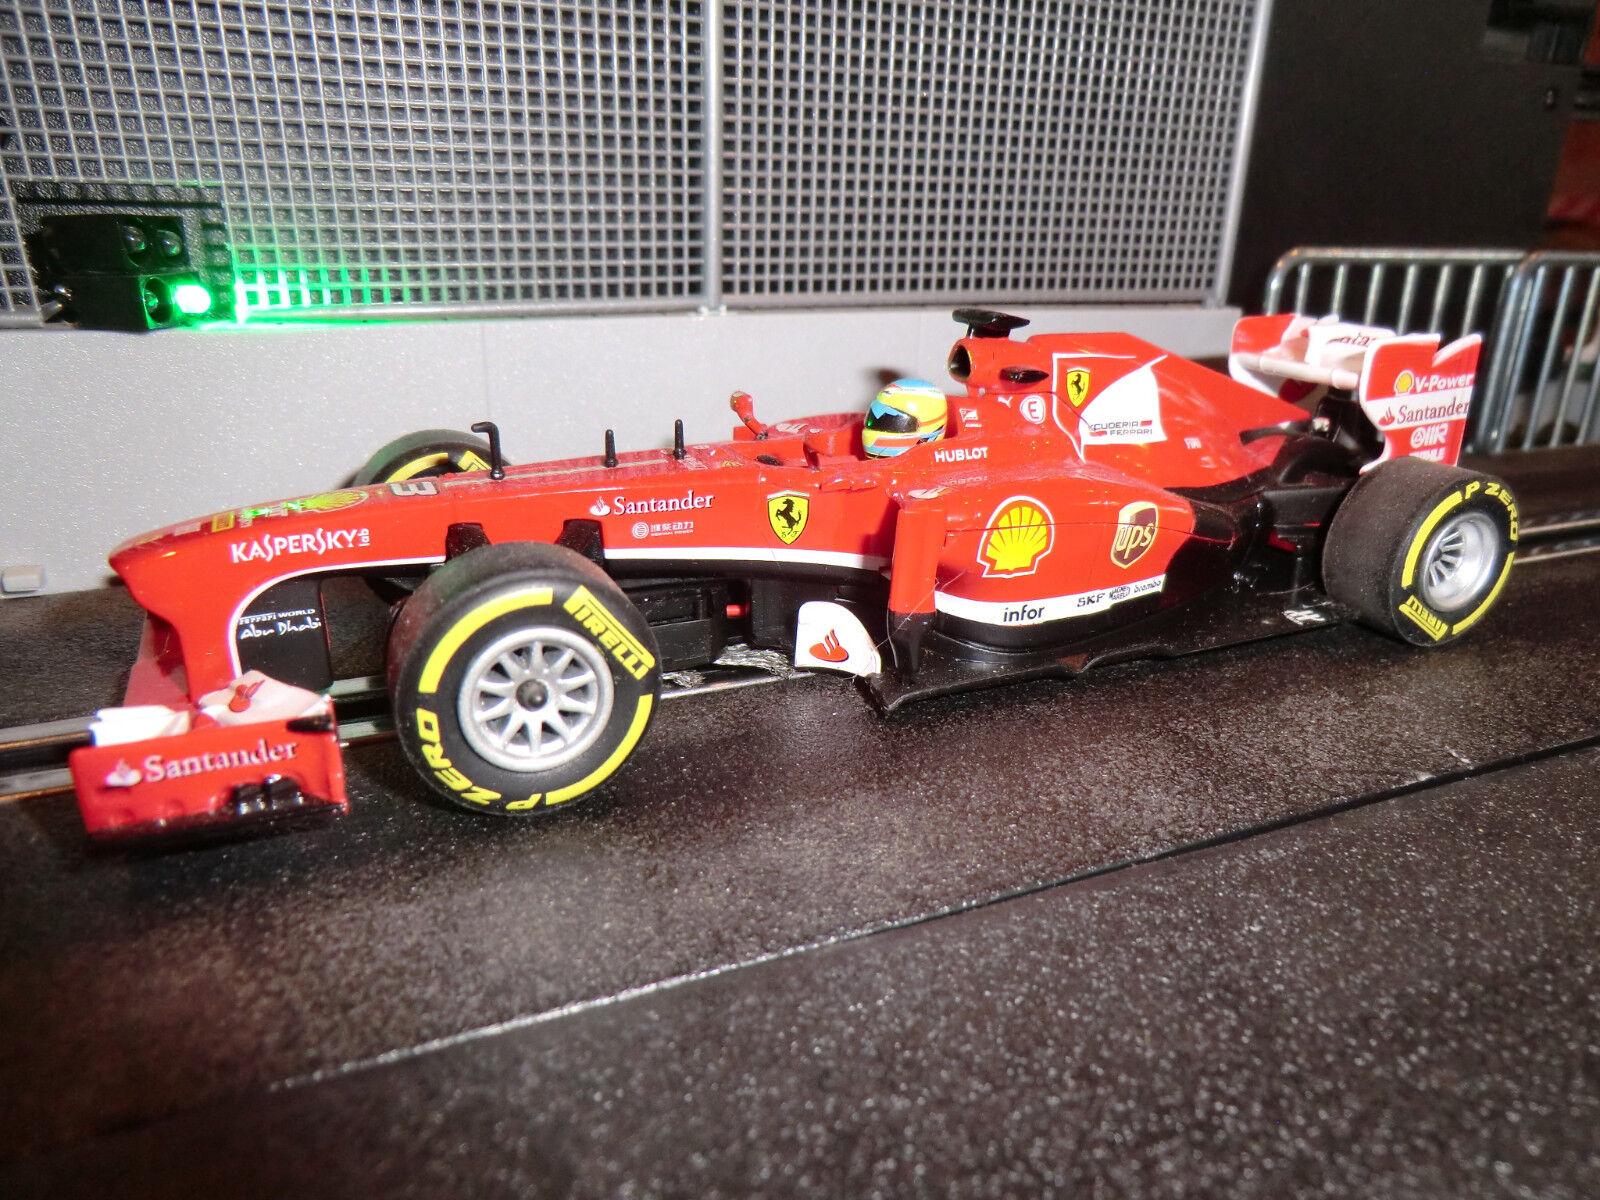 30695 CARRERA DIGITAL 132  F1 Ferrari No. 3 + Blink Licht Bausatz - NEU in OVP